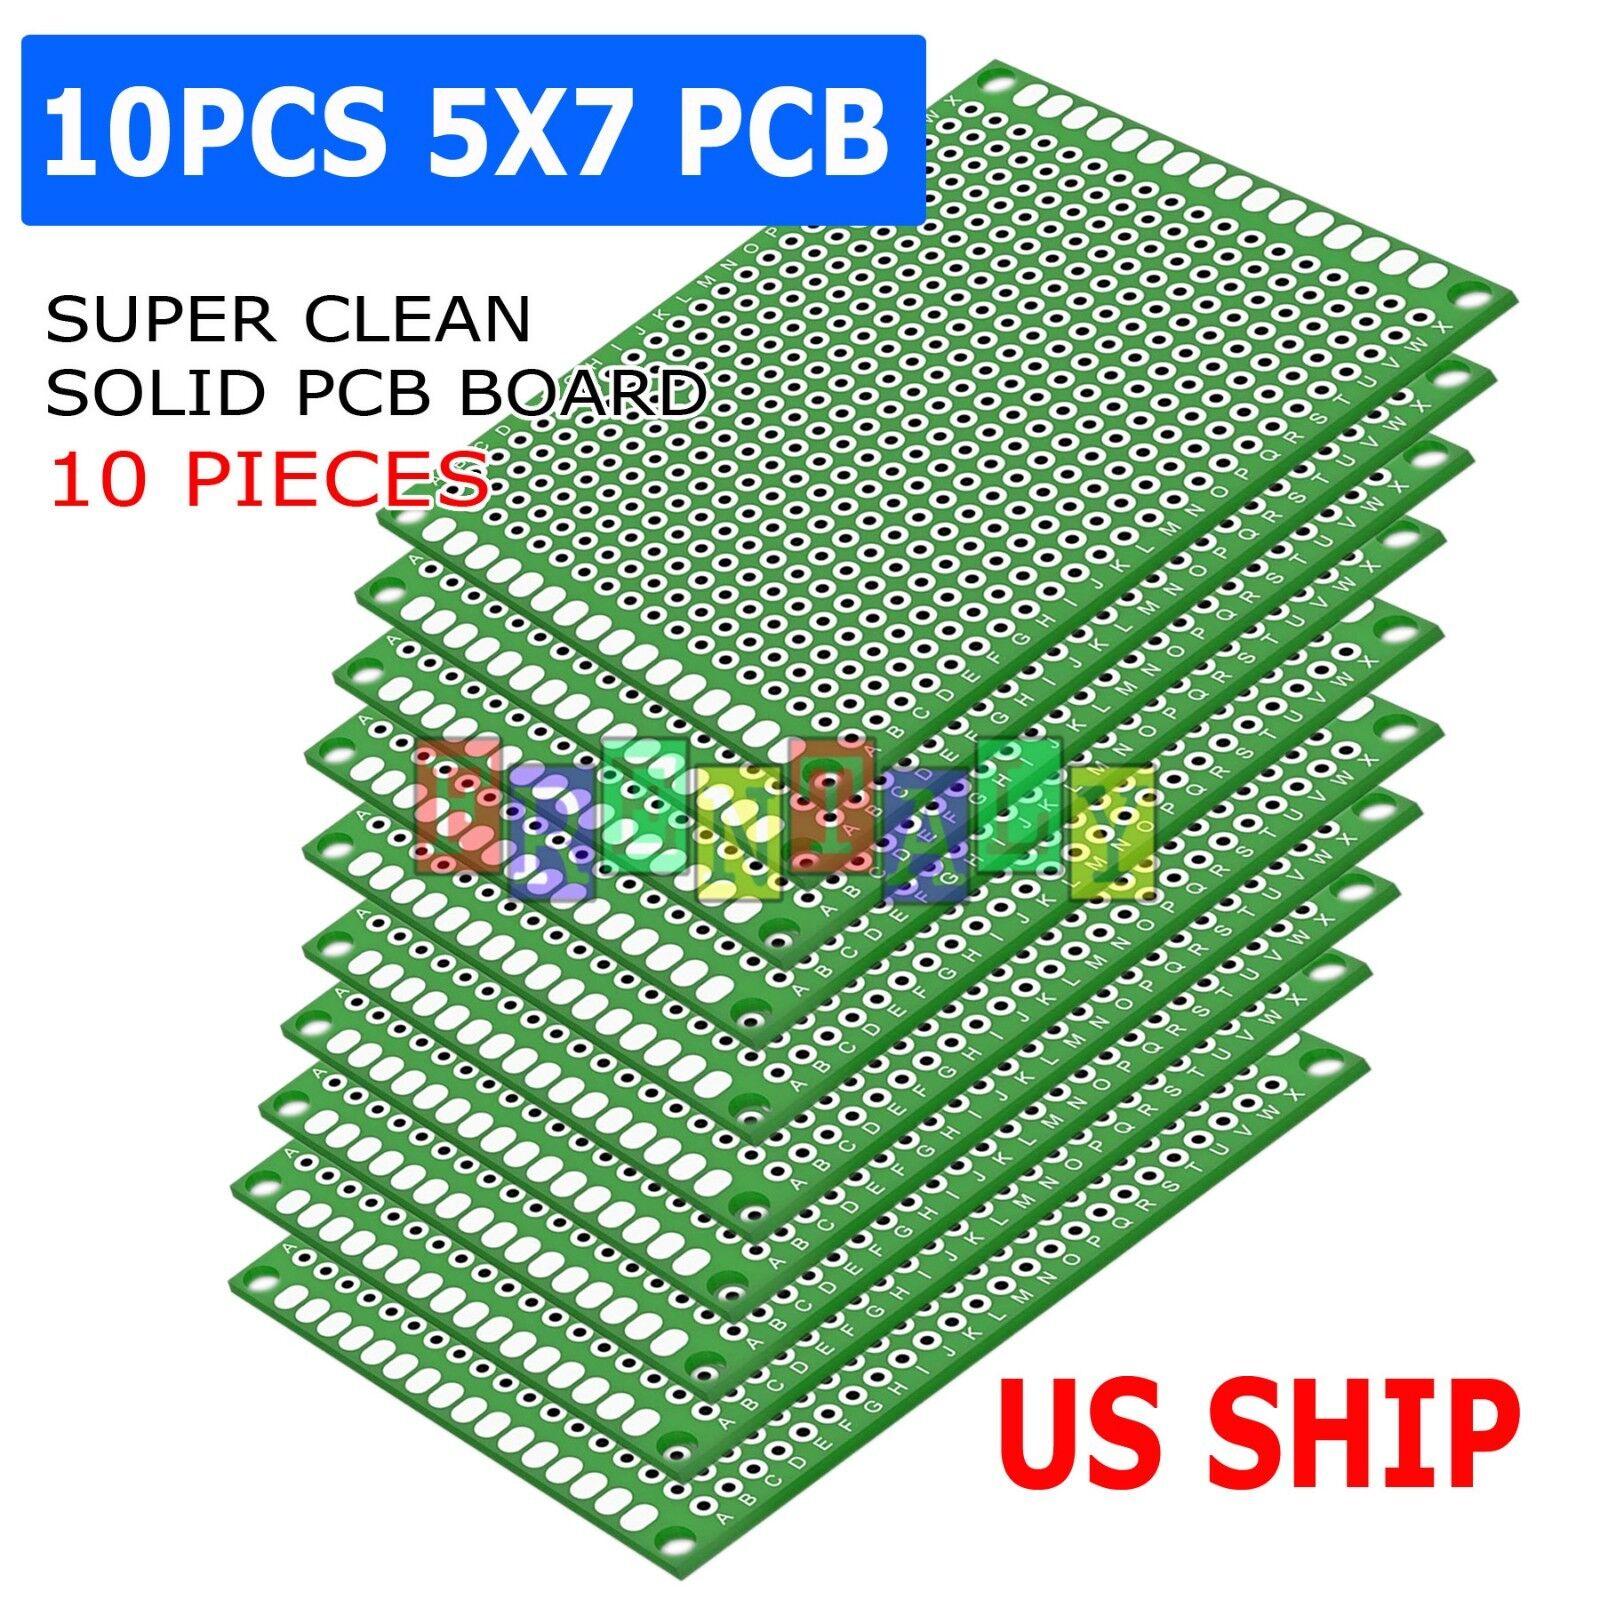 Prototyping Printed Circuit Board Pcb Prototype Breadboard Stripboard